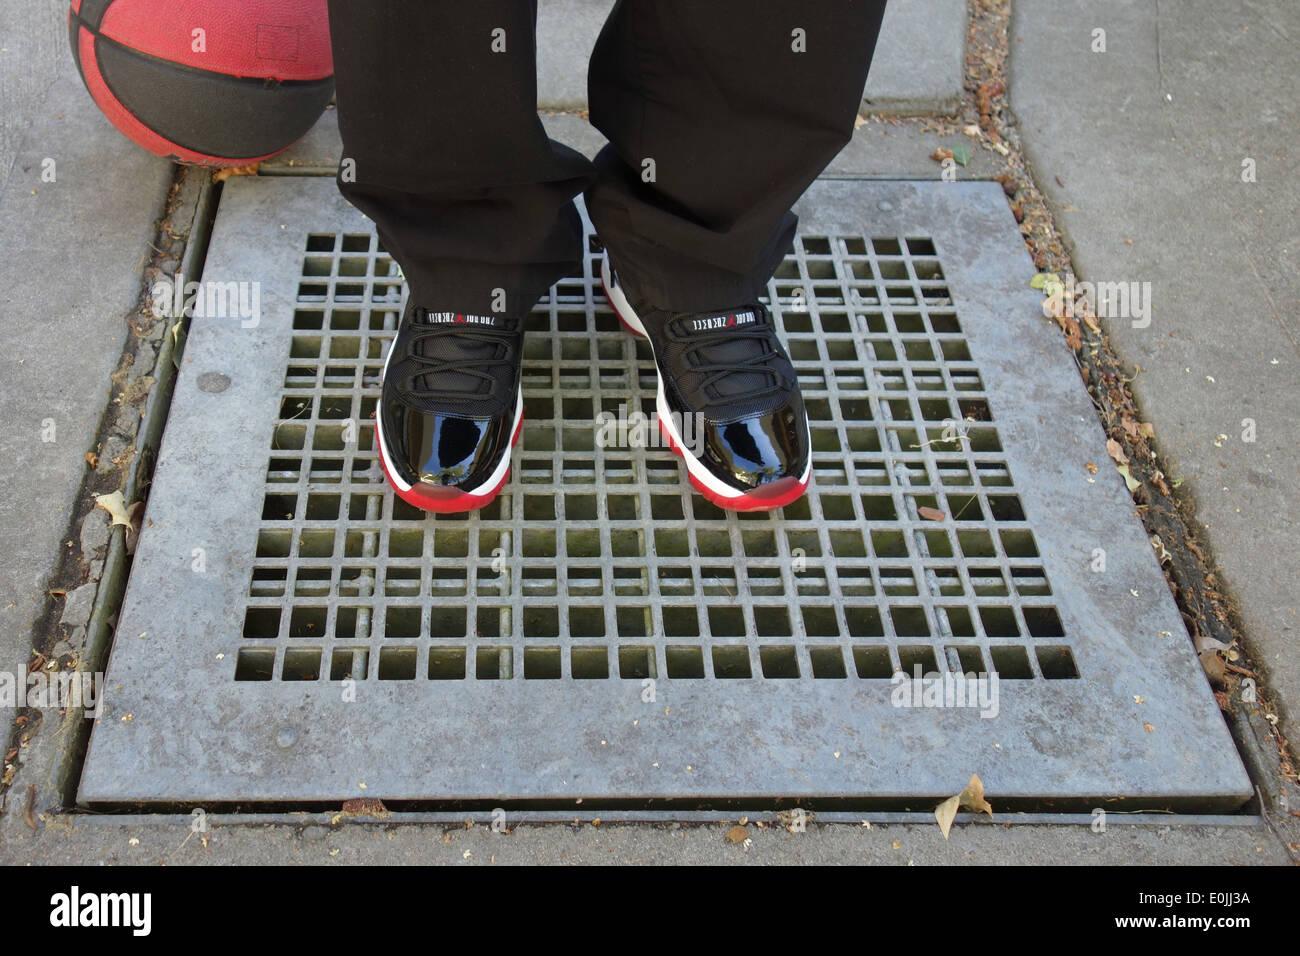 Nike Air Jordan Retro 11 XI (Black and Red Stock Photo 6a80250fa